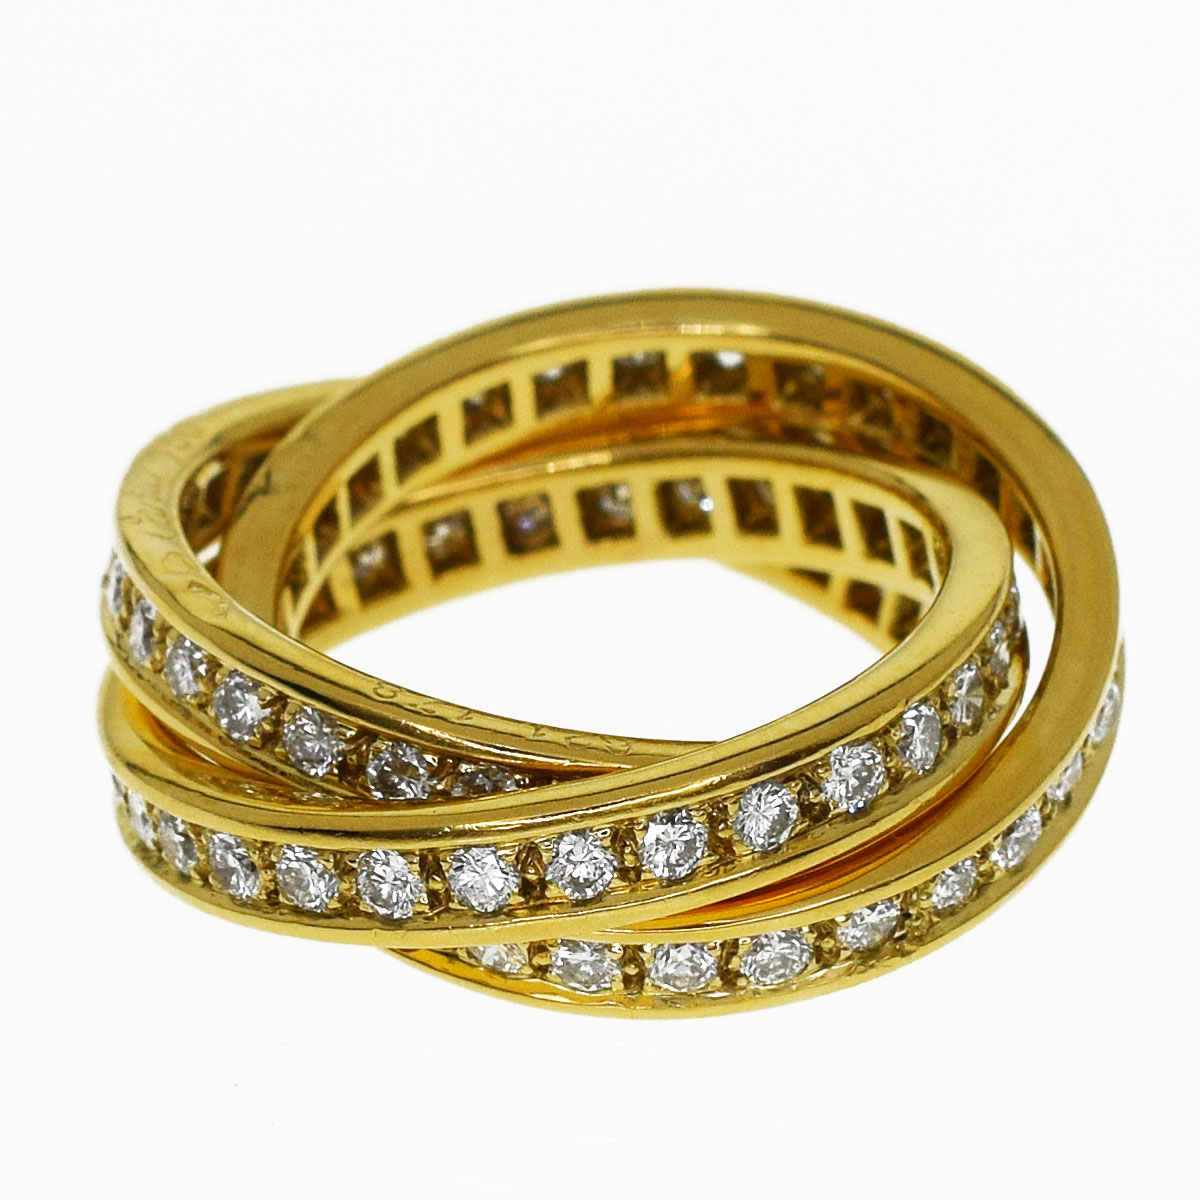 40abb96026f47 Cartier Cartier three diamond trinity ring 750 K18 YG yellow gold Japan  size approximately nine ...